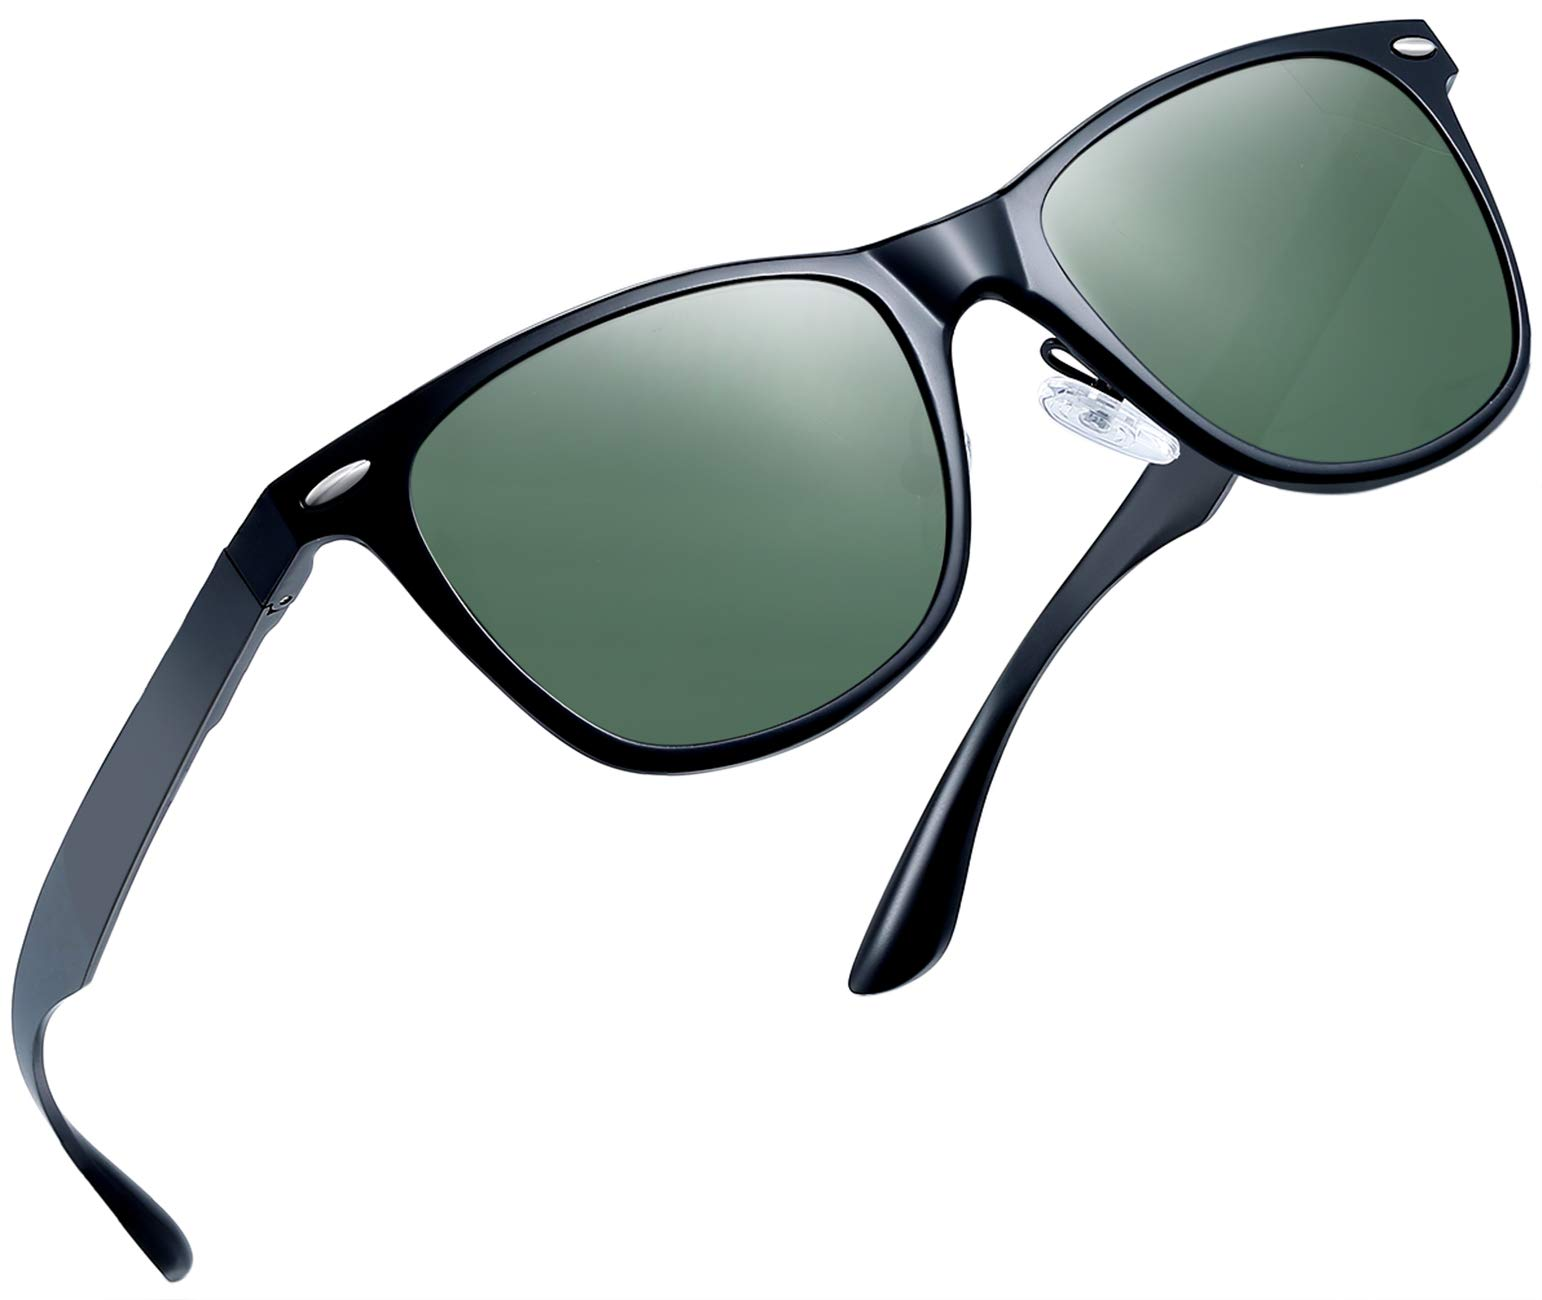 Joopin Unisex Polarized Sunglasses Classic Men Retro UV400 Brand Designer Sun glasses (Al Mg Alloy G15, as the pictures)